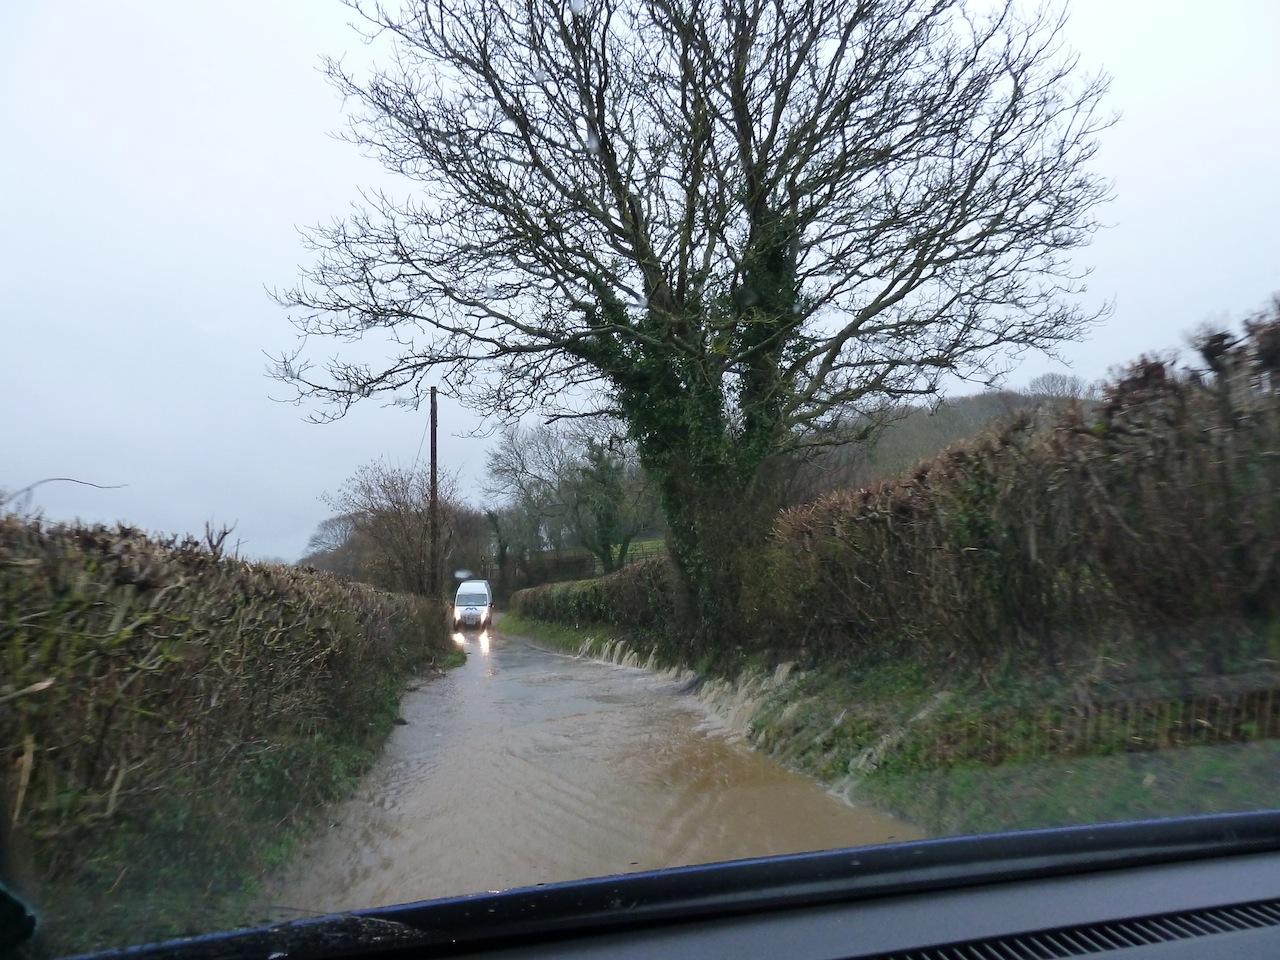 Floaded roads KH 1